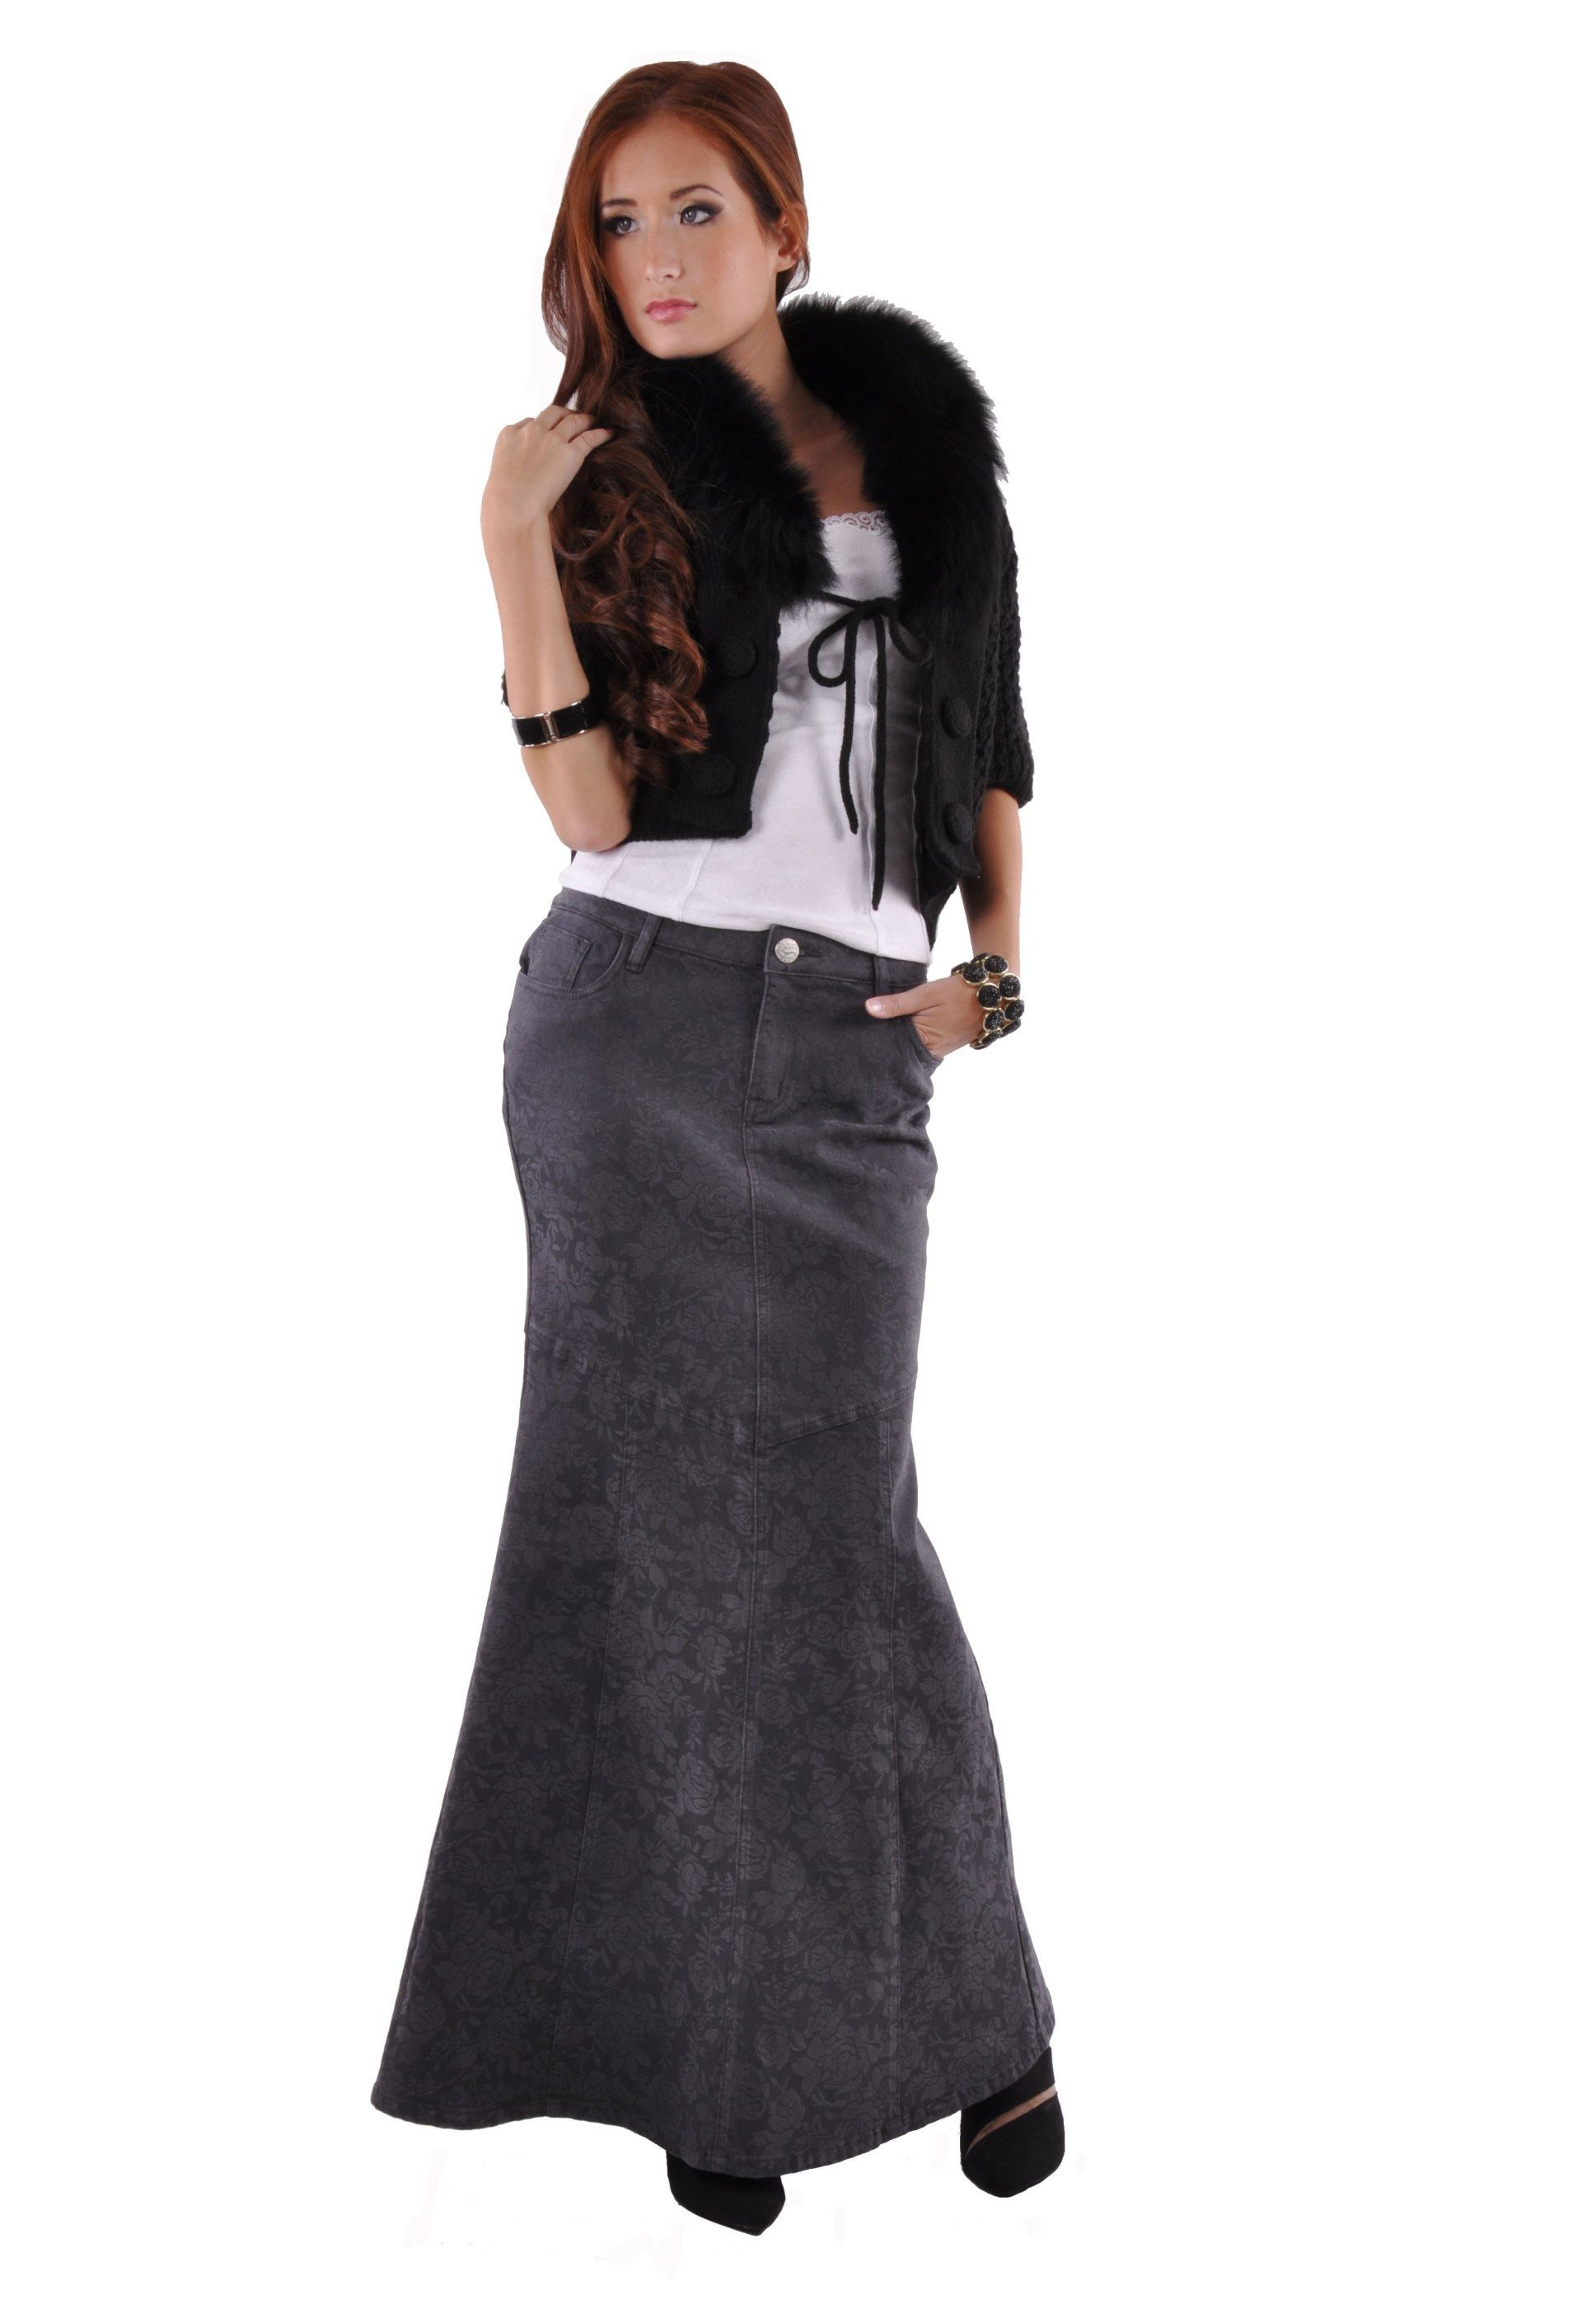 5564c0c9de Rosie Chic Long Denim Skirt   My Style   Denim skirt, Skirts, Plus ...